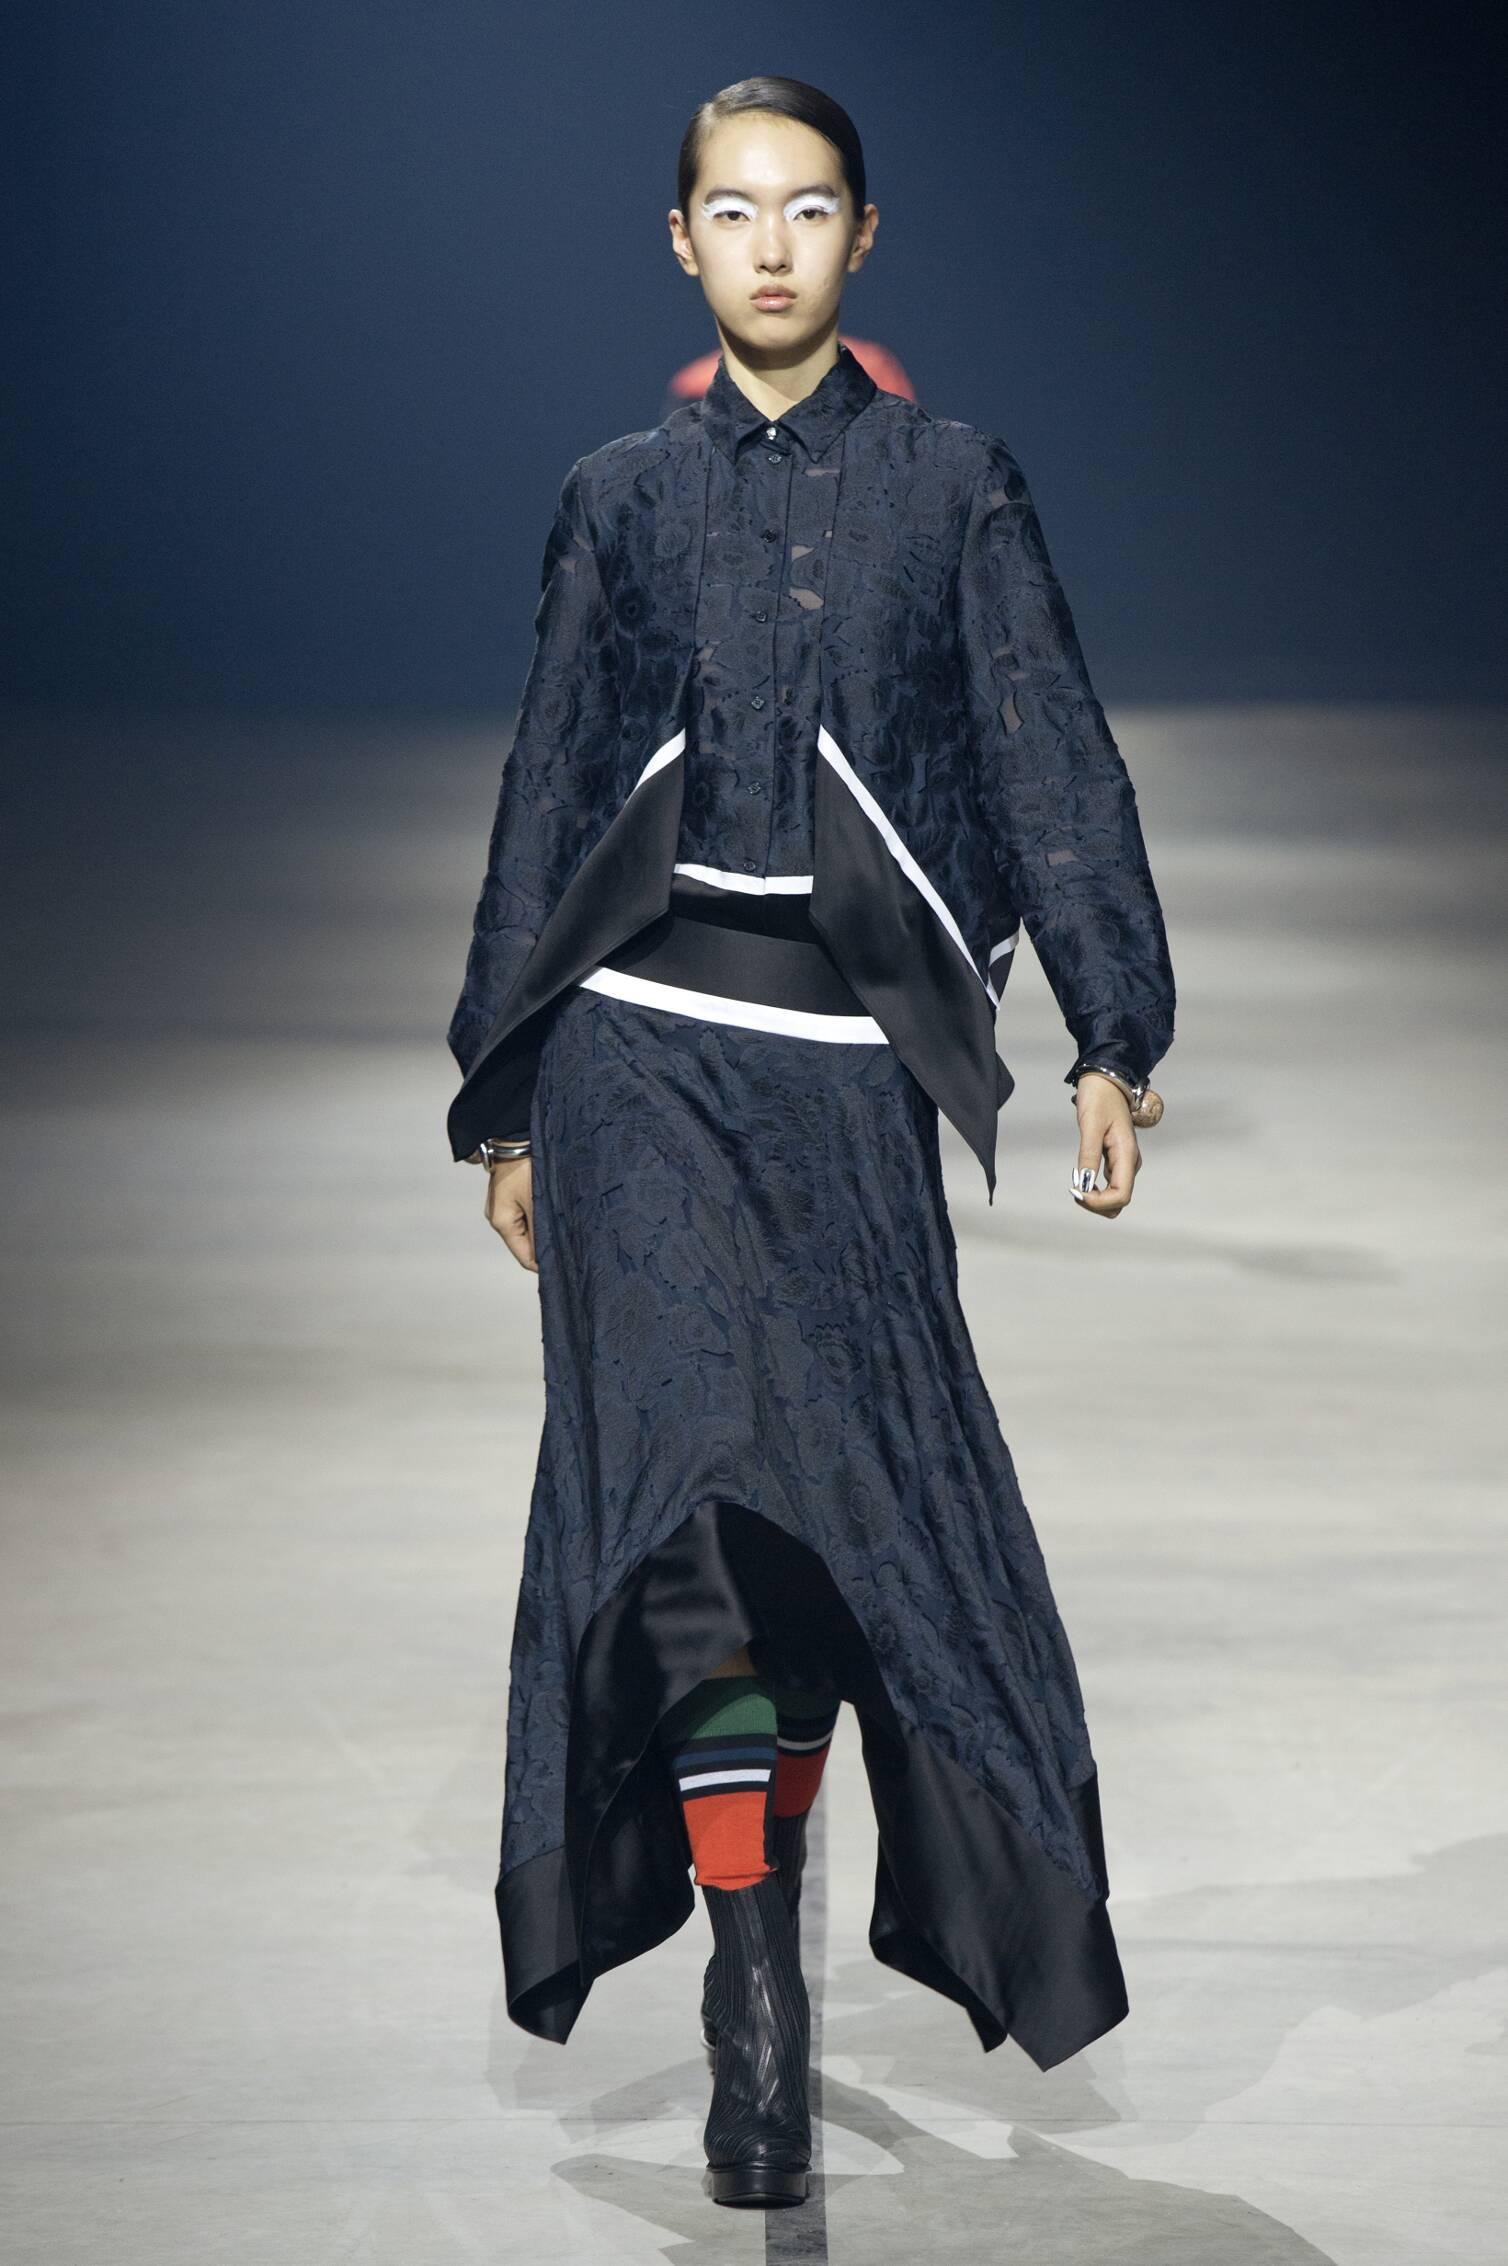 2015 Fashion Woman Model Kenzo Collection Catwalk